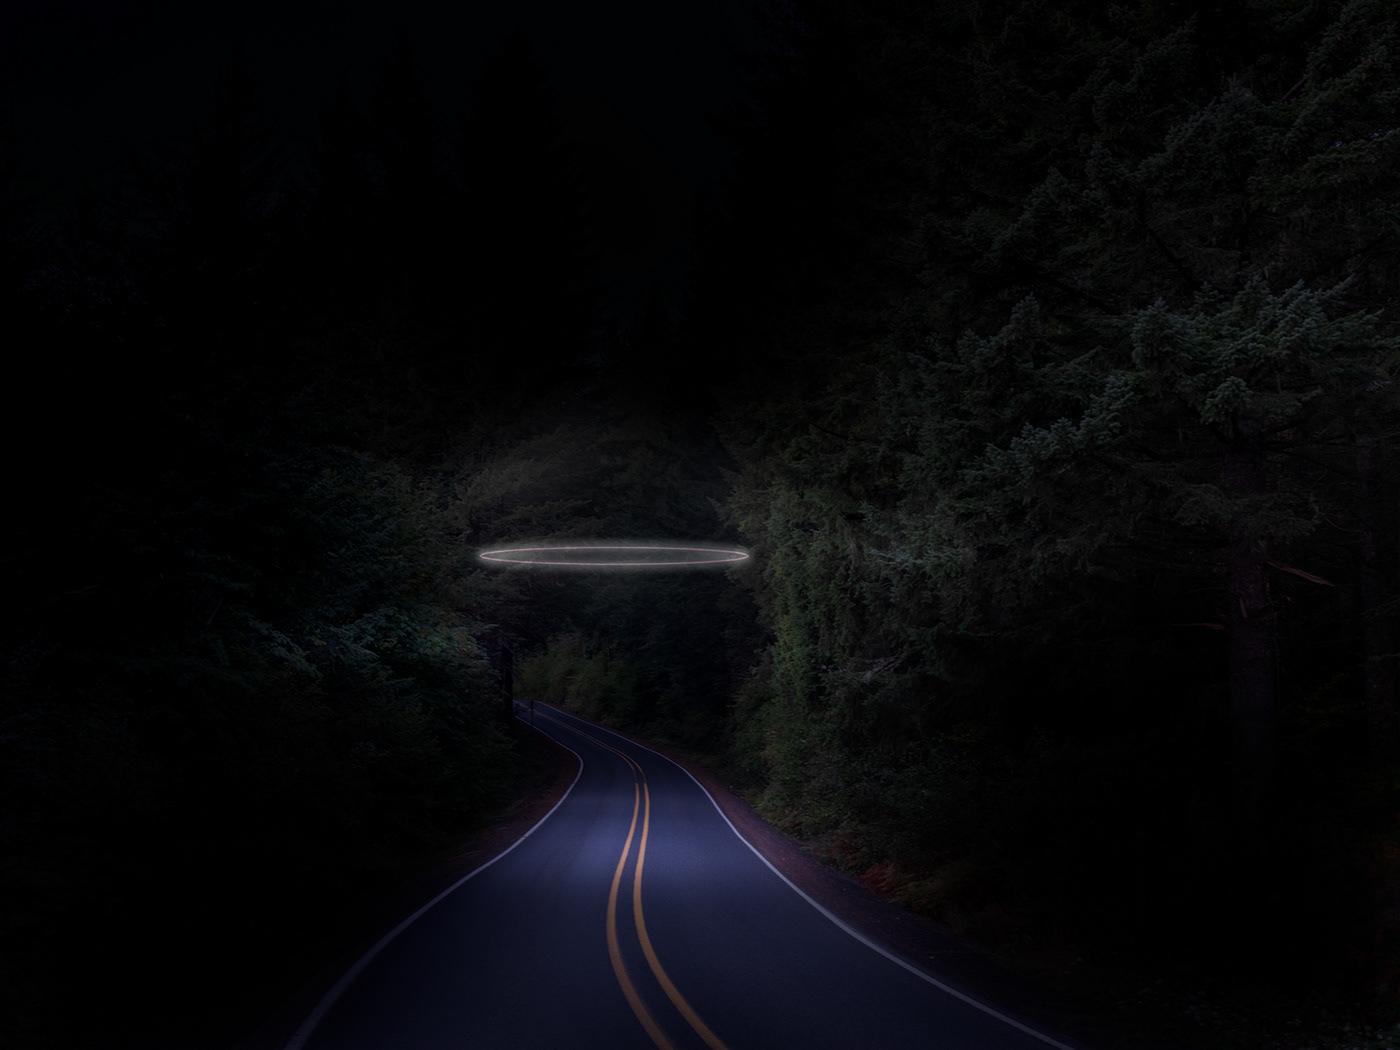 neon iceland Oregon night color